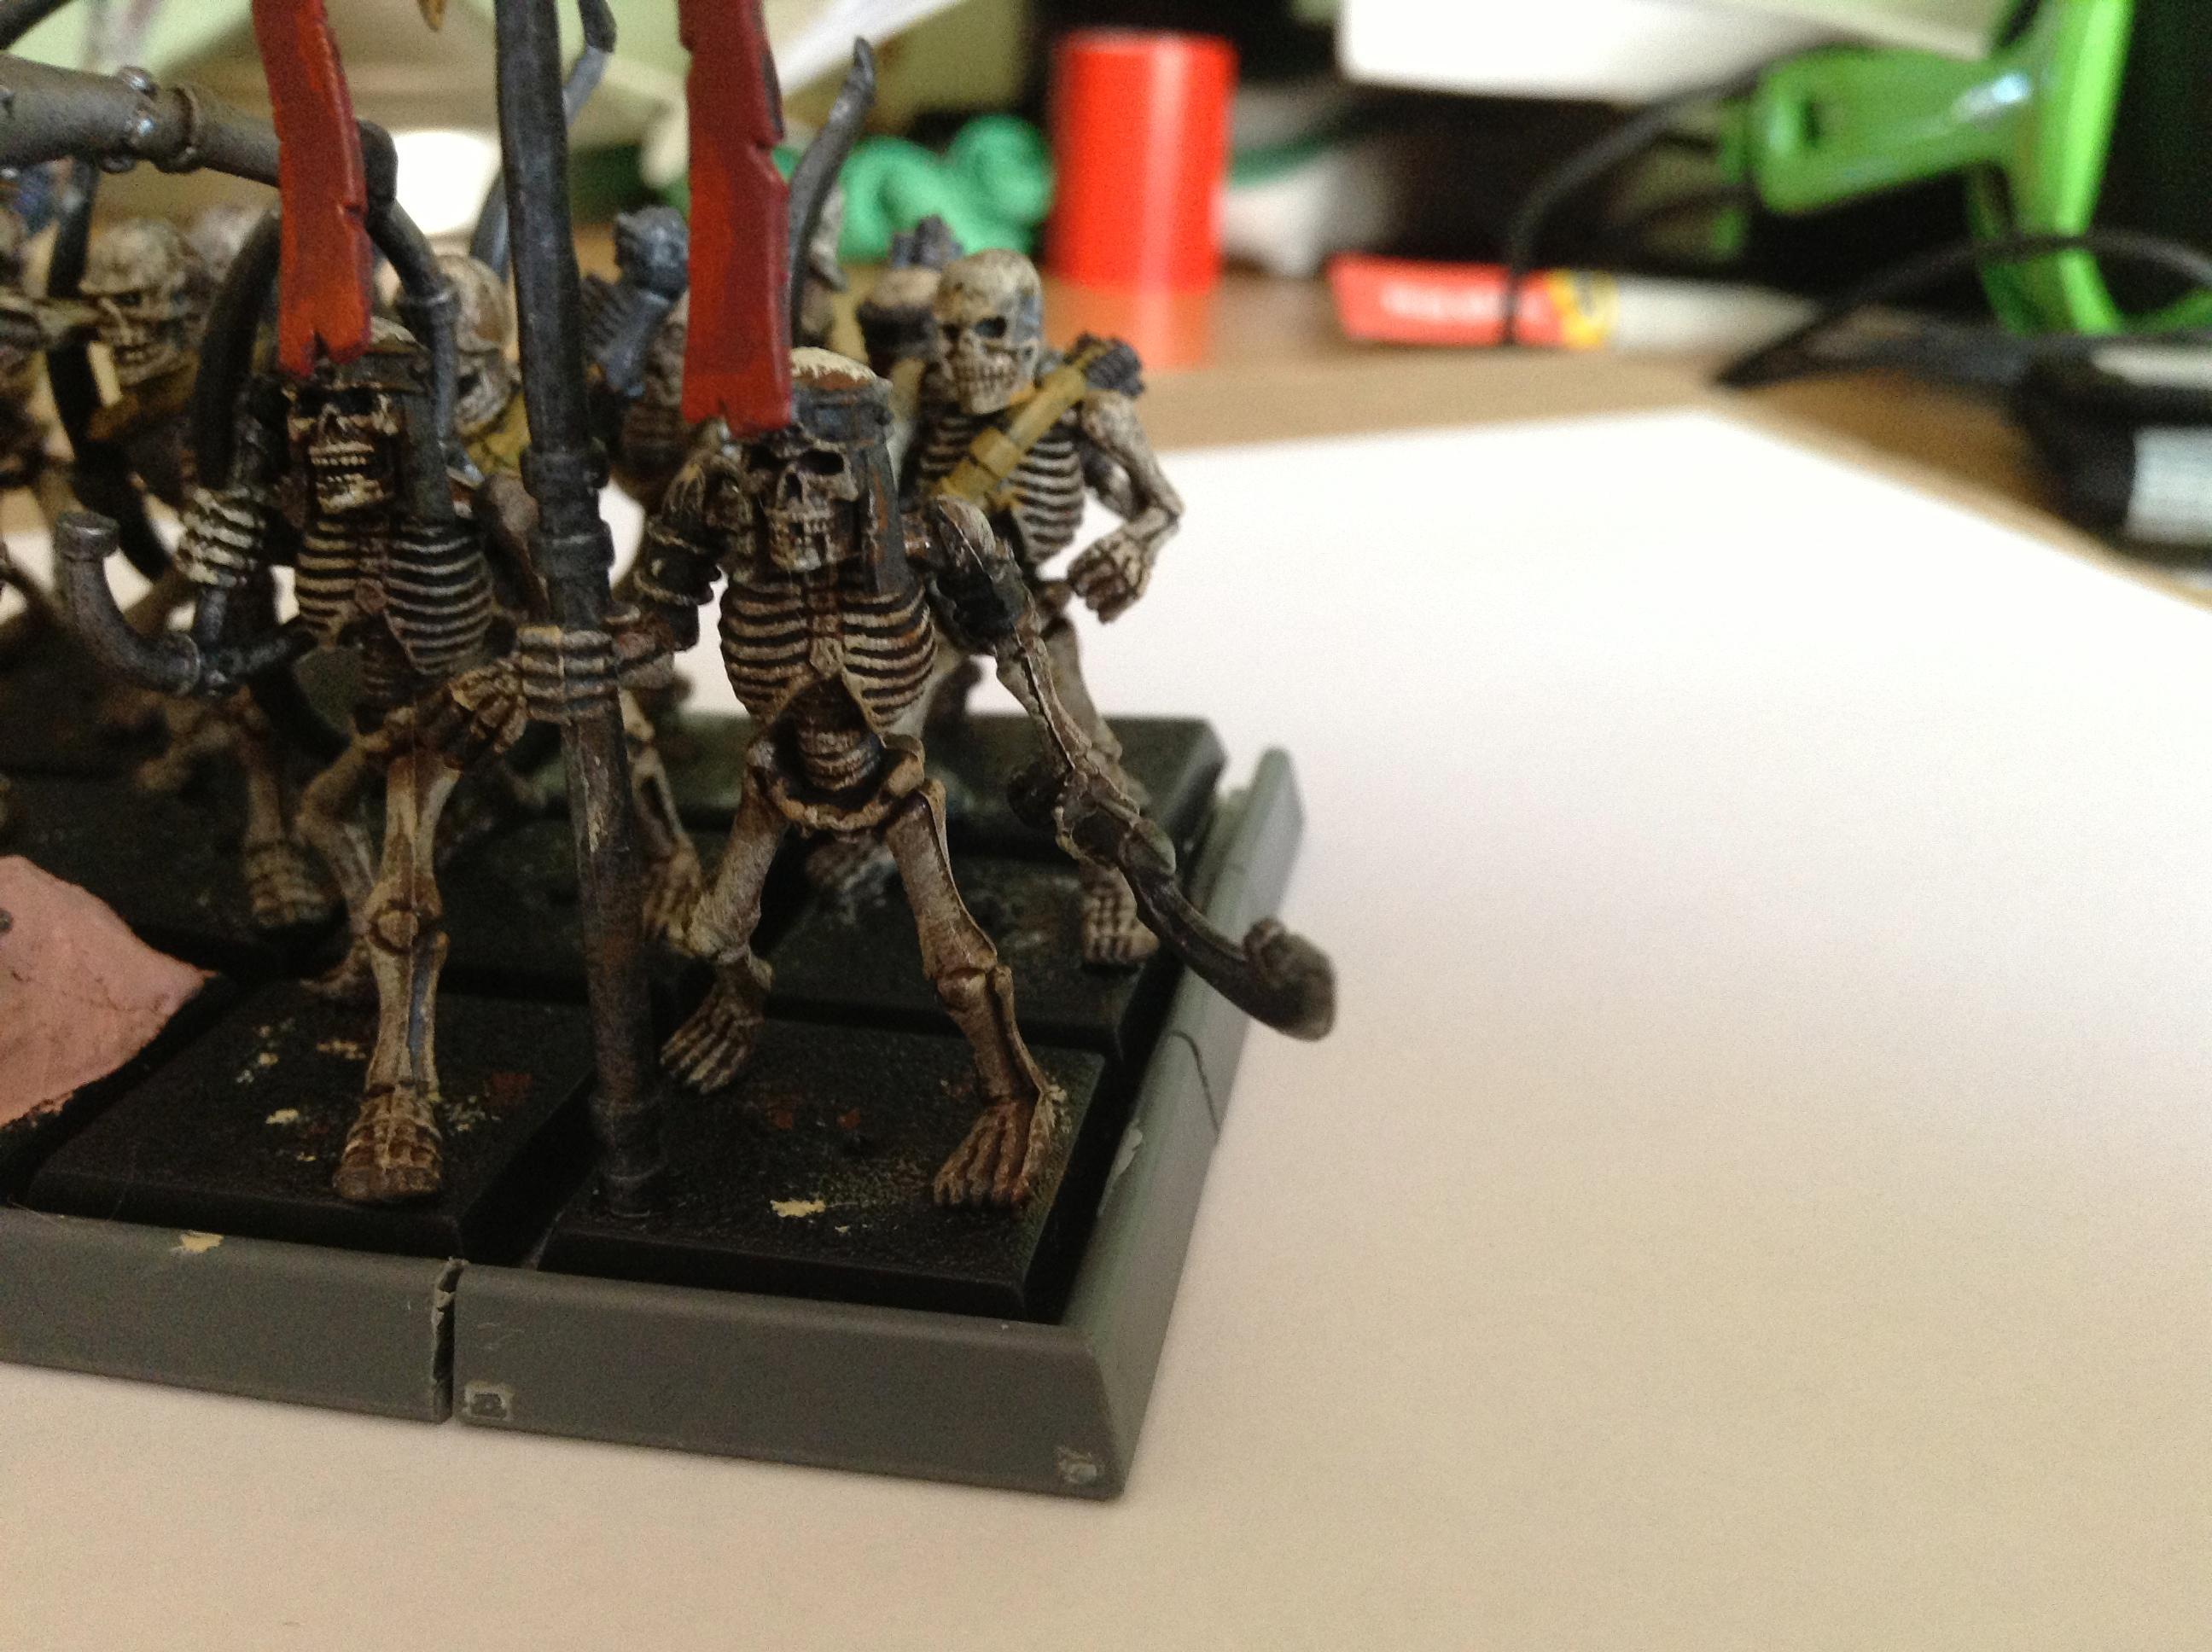 Age Of Sigmar, Archers, Kings, Skeletons, Tomb, Warhammer Fantasy